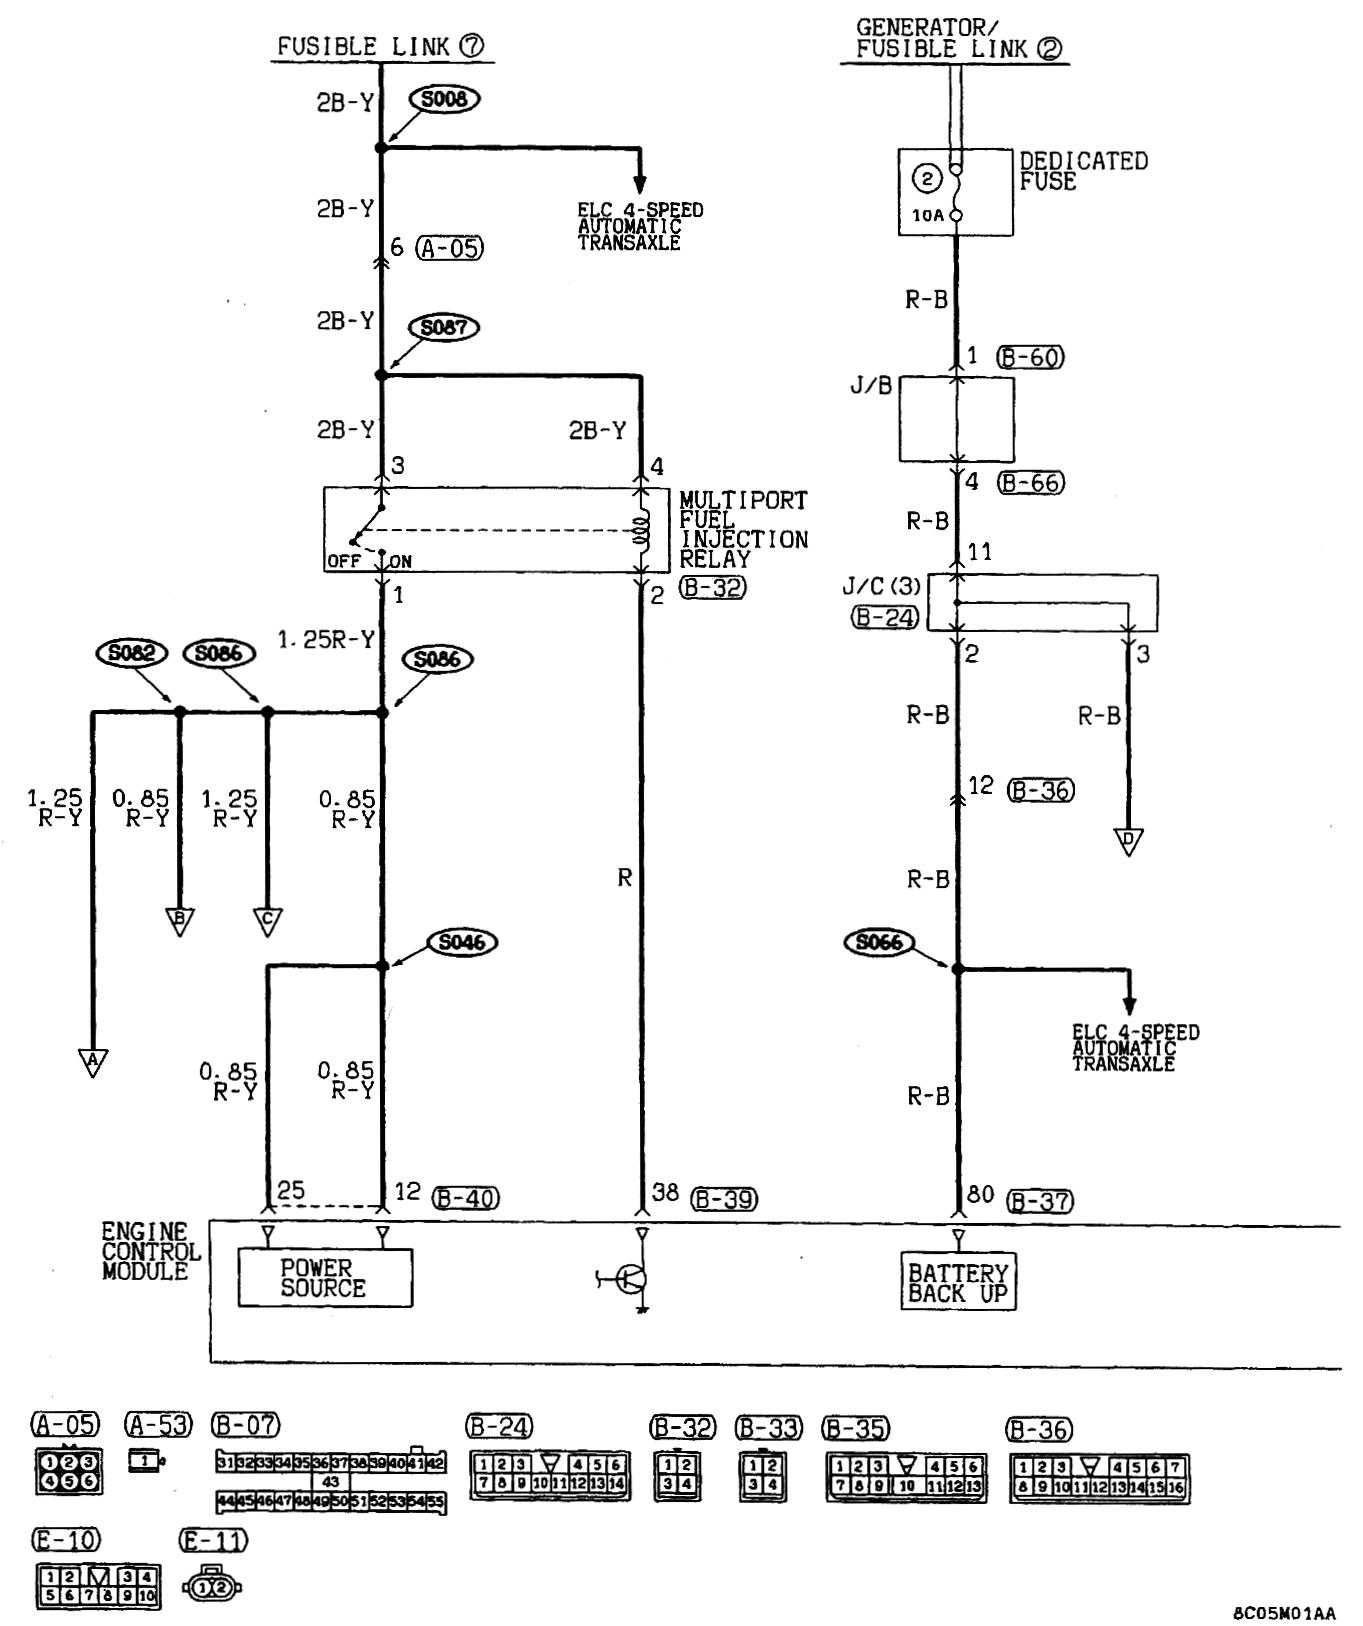 VX_1139] 93 Mitsubishi Mirage Fuse Diagram